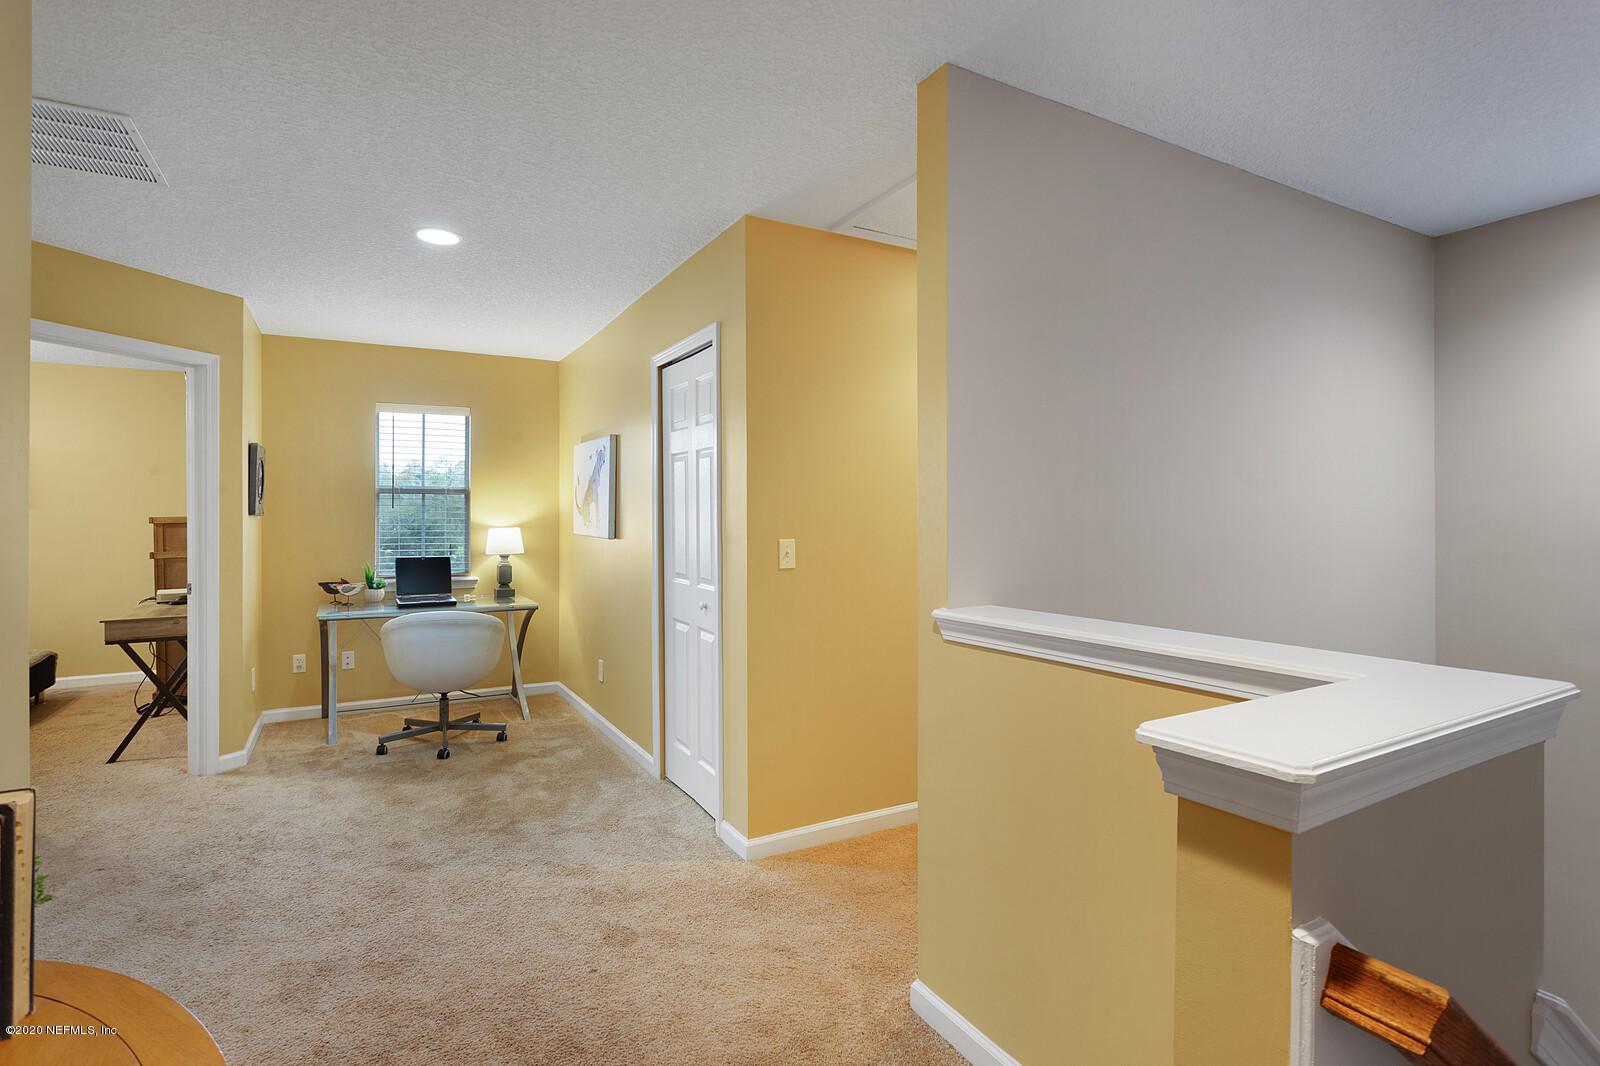 1465 SHADOW CREEK, ORANGE PARK, FLORIDA 32065, 4 Bedrooms Bedrooms, ,2 BathroomsBathrooms,Residential,For sale,SHADOW CREEK,1082574